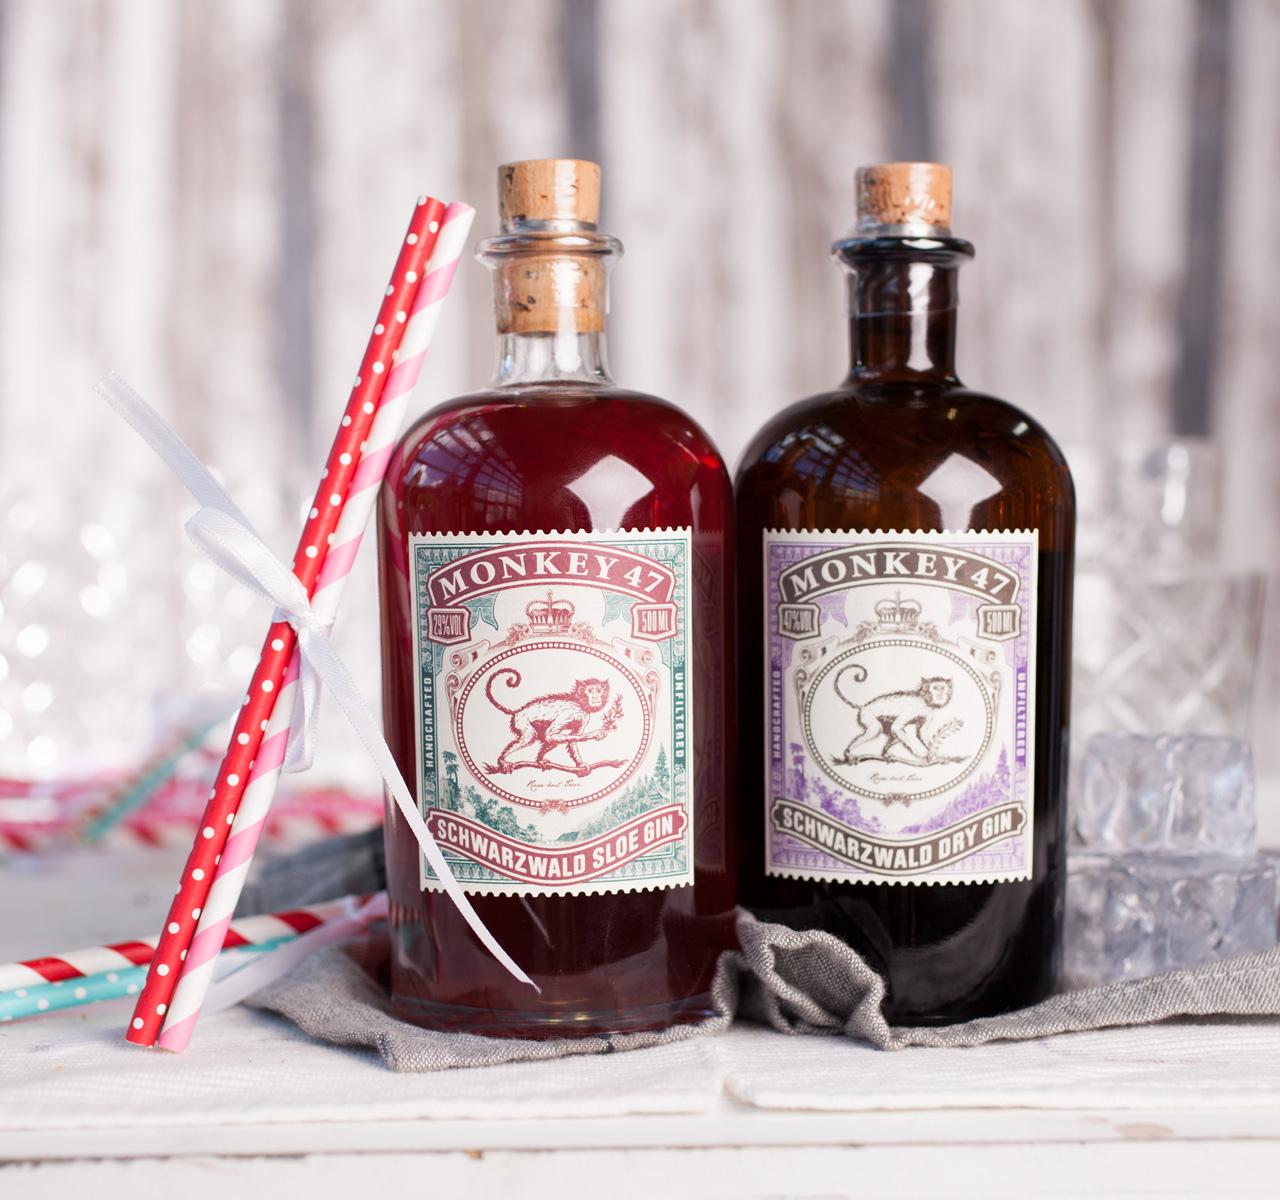 Monkey47 Dry Gin + Monkey47 Sloe Gin